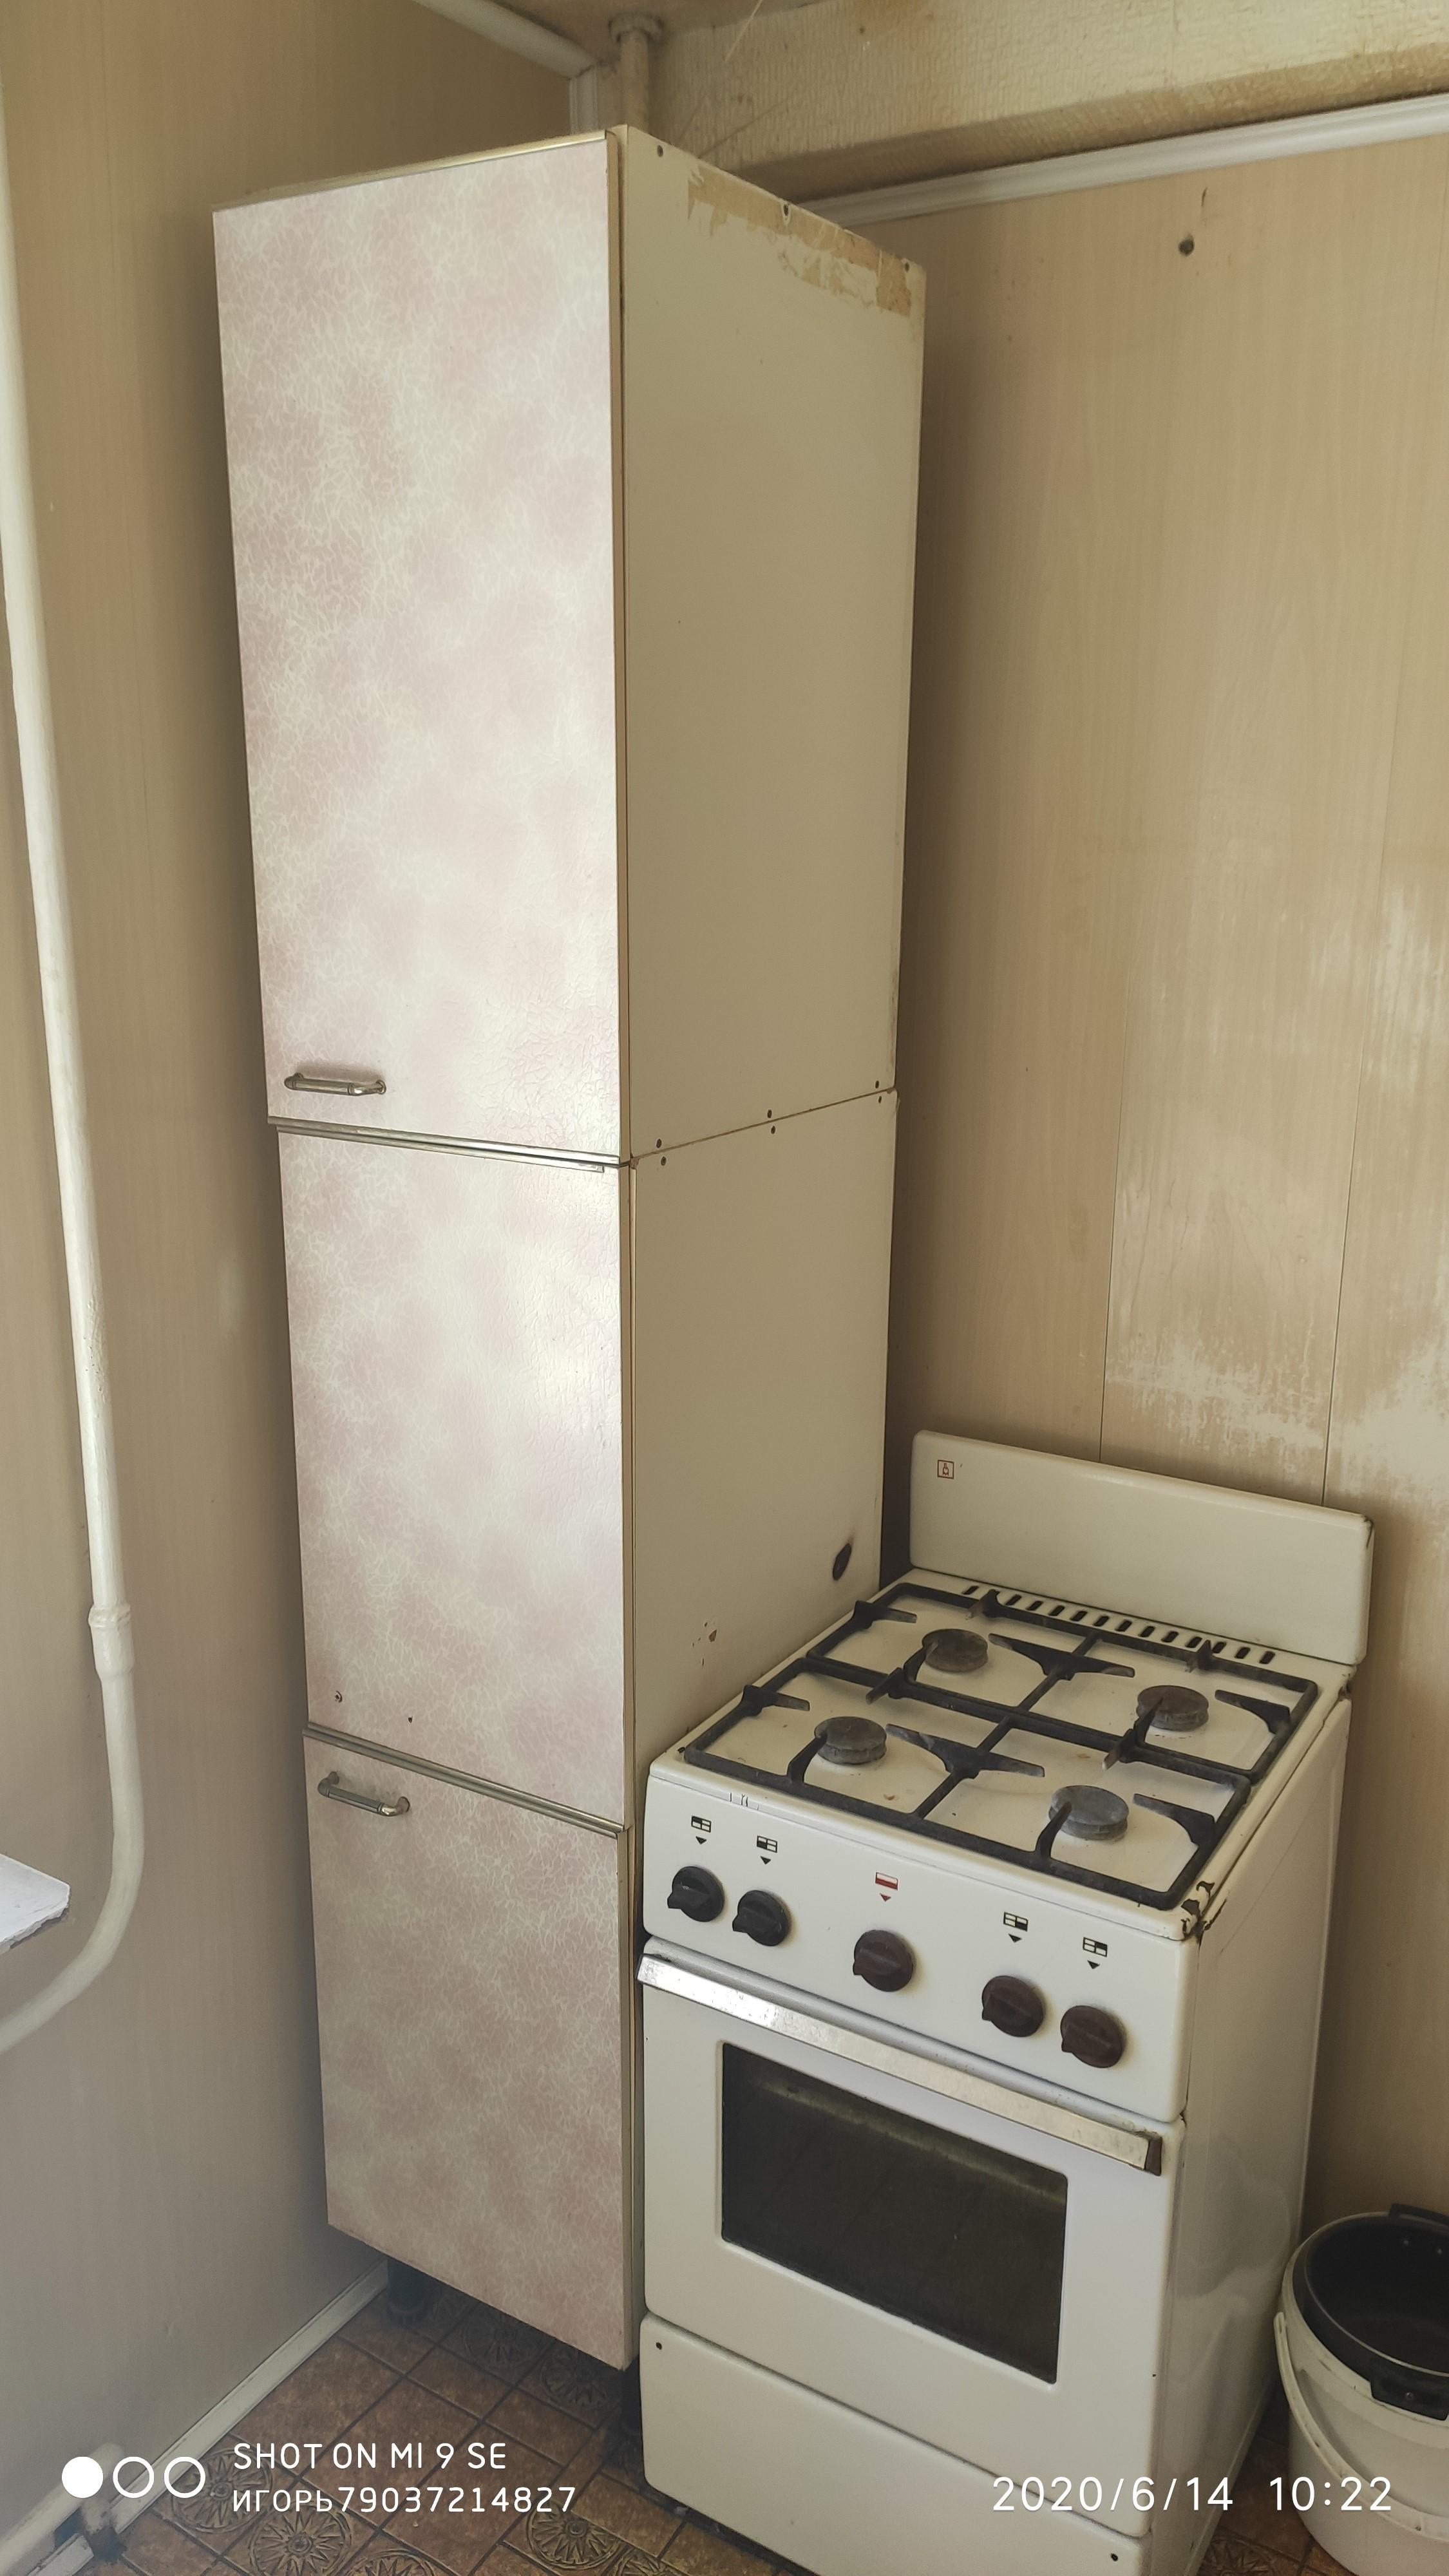 Продаётся 2-комнатная квартира 36.0 кв.м. этаж 4/5 за 2 550 000 руб